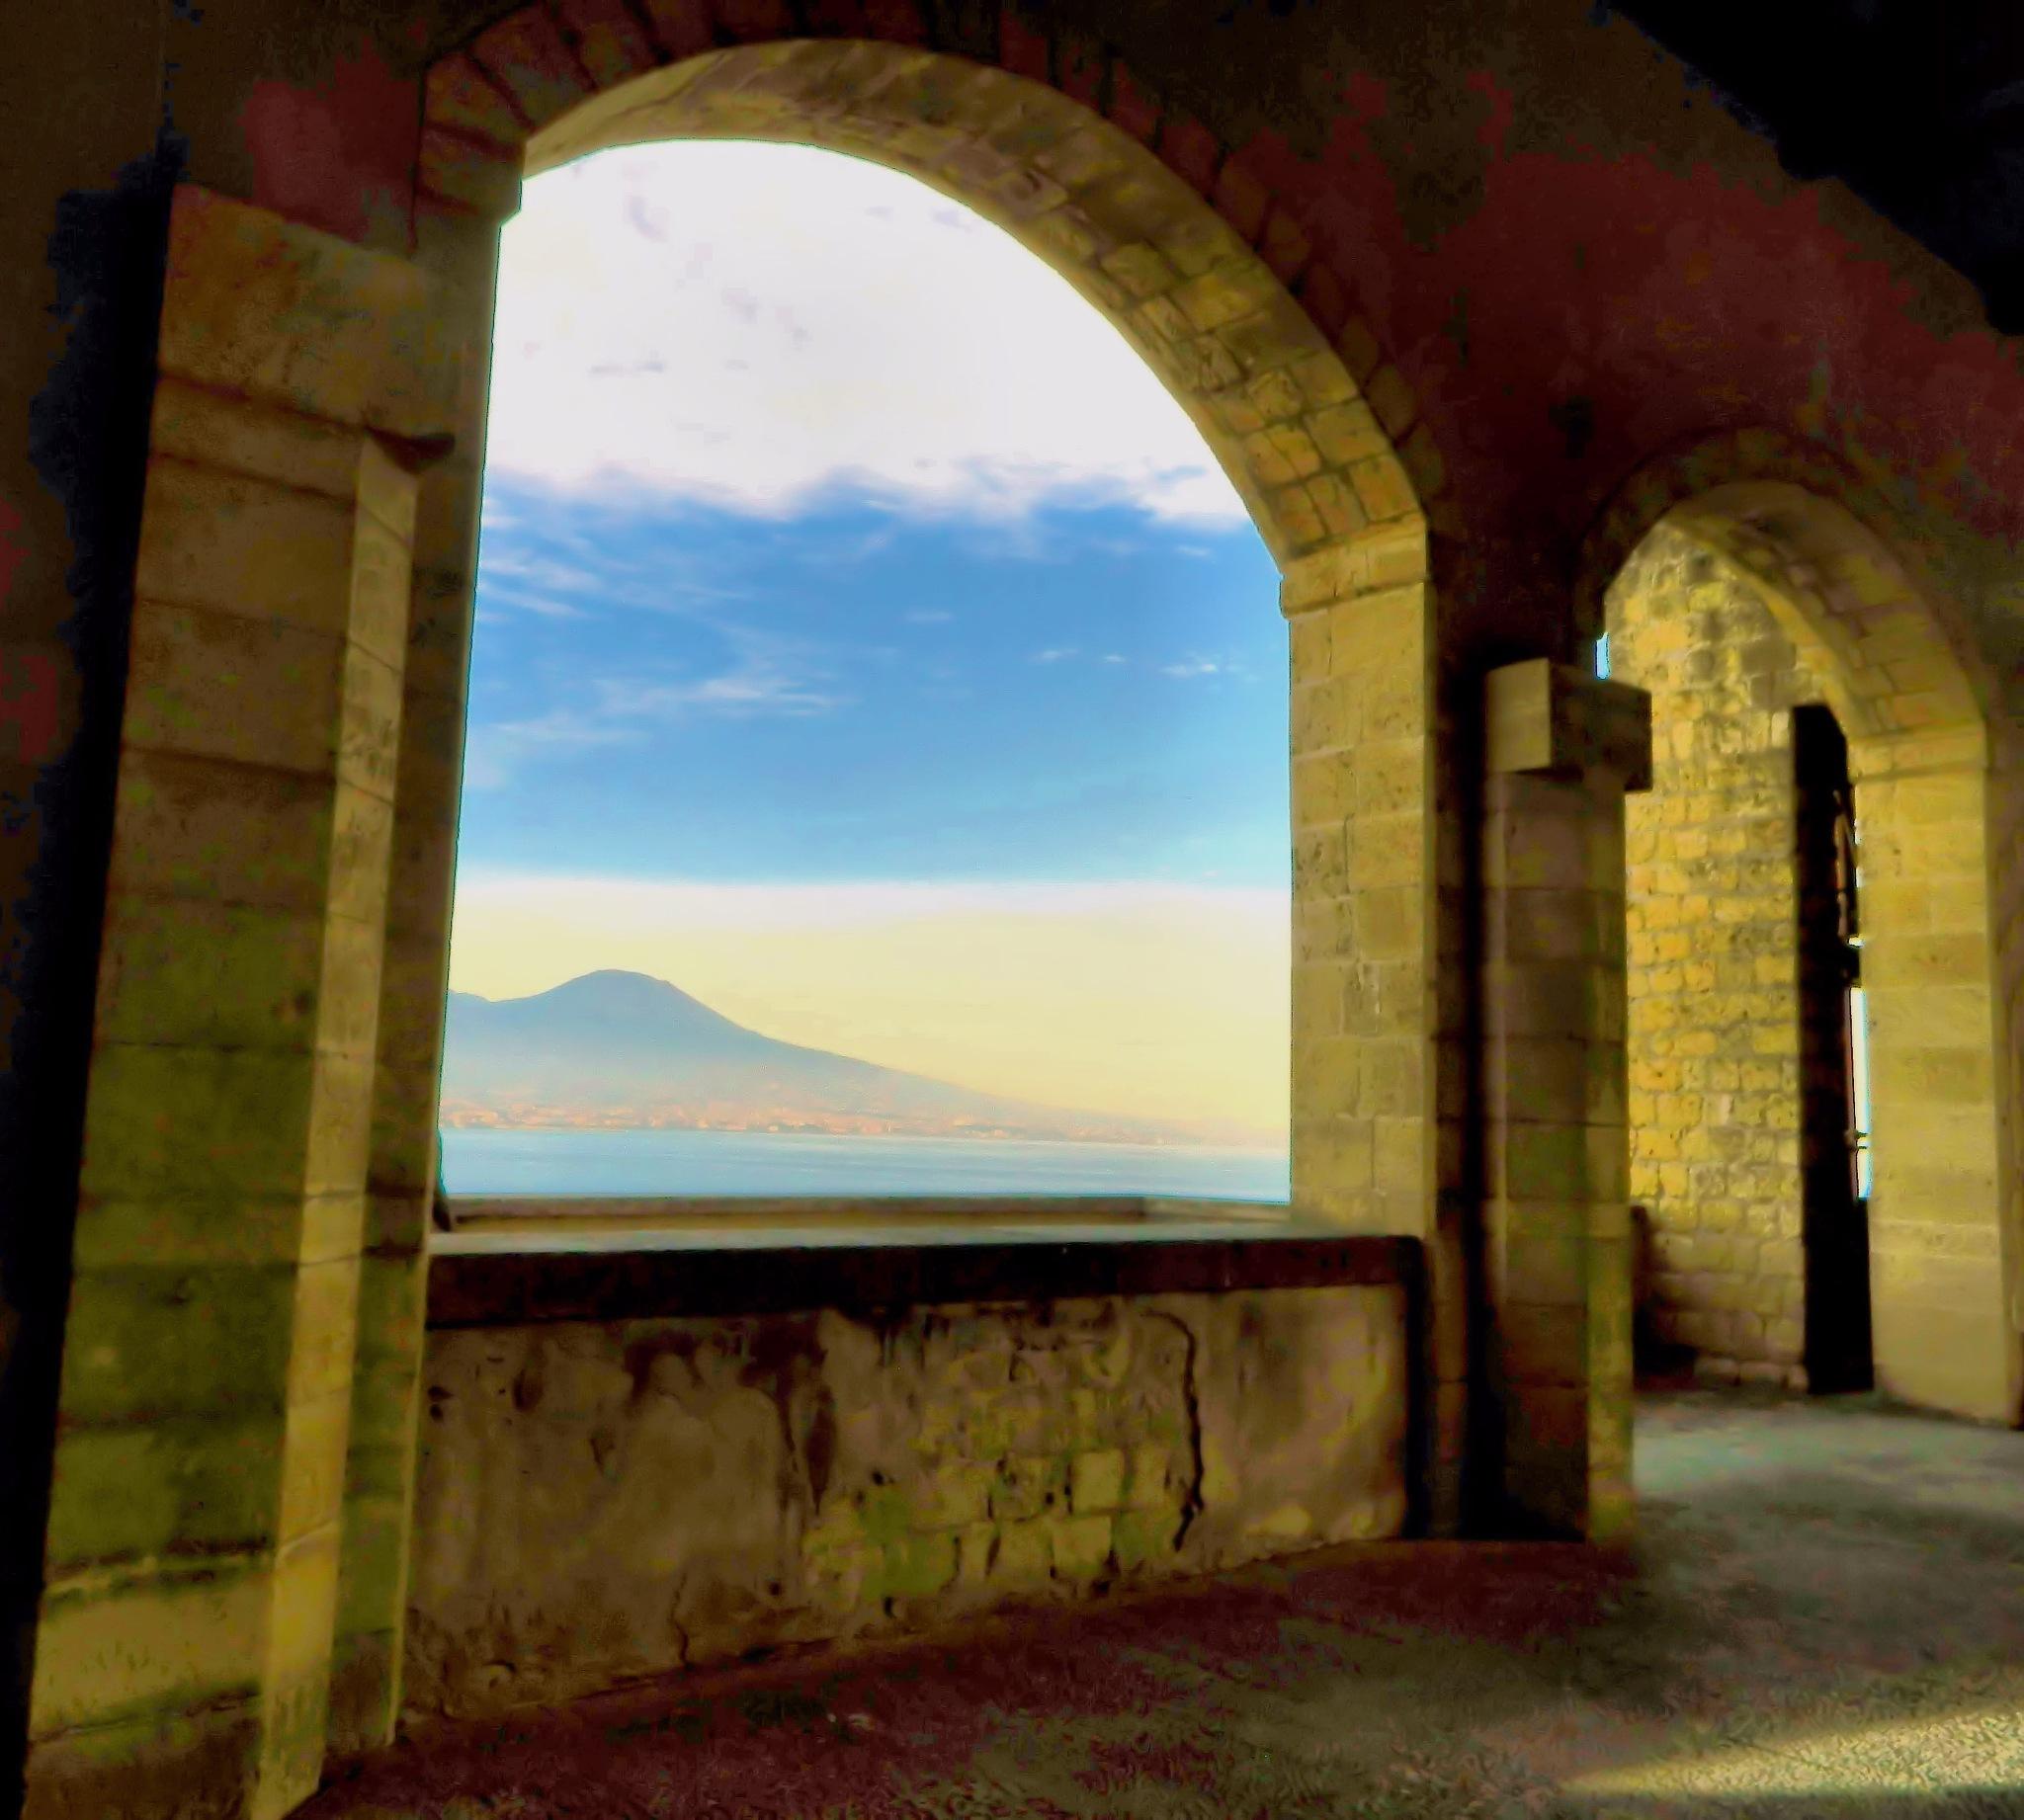 Naples - Castel dell'Ovo - Vesuvio or Vesuvius  by Arnaldo De Lisio